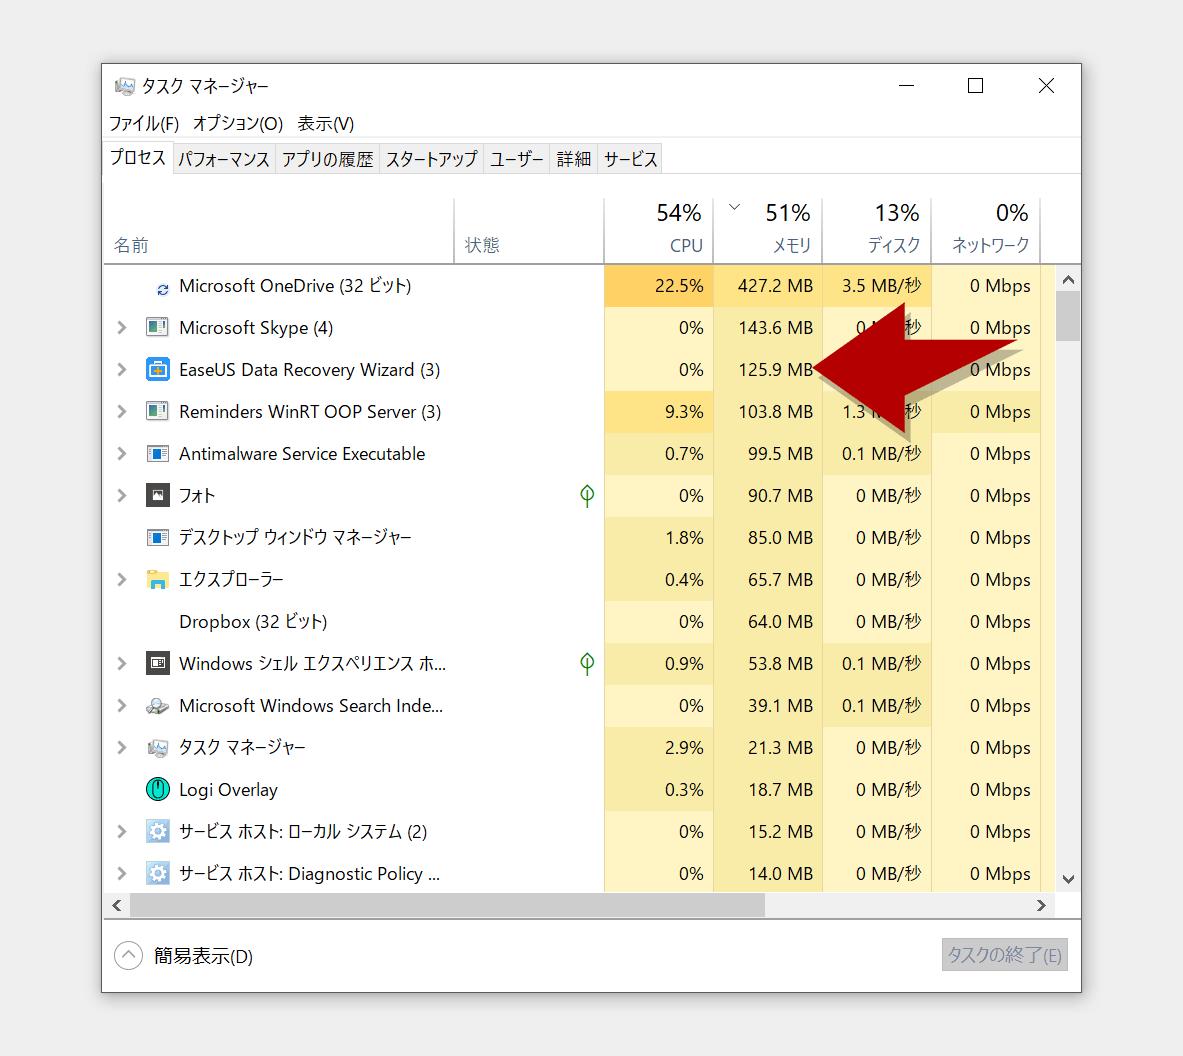 EaseUSDataRecoveryWizardメモリ8GBPCでのメモリ使用量